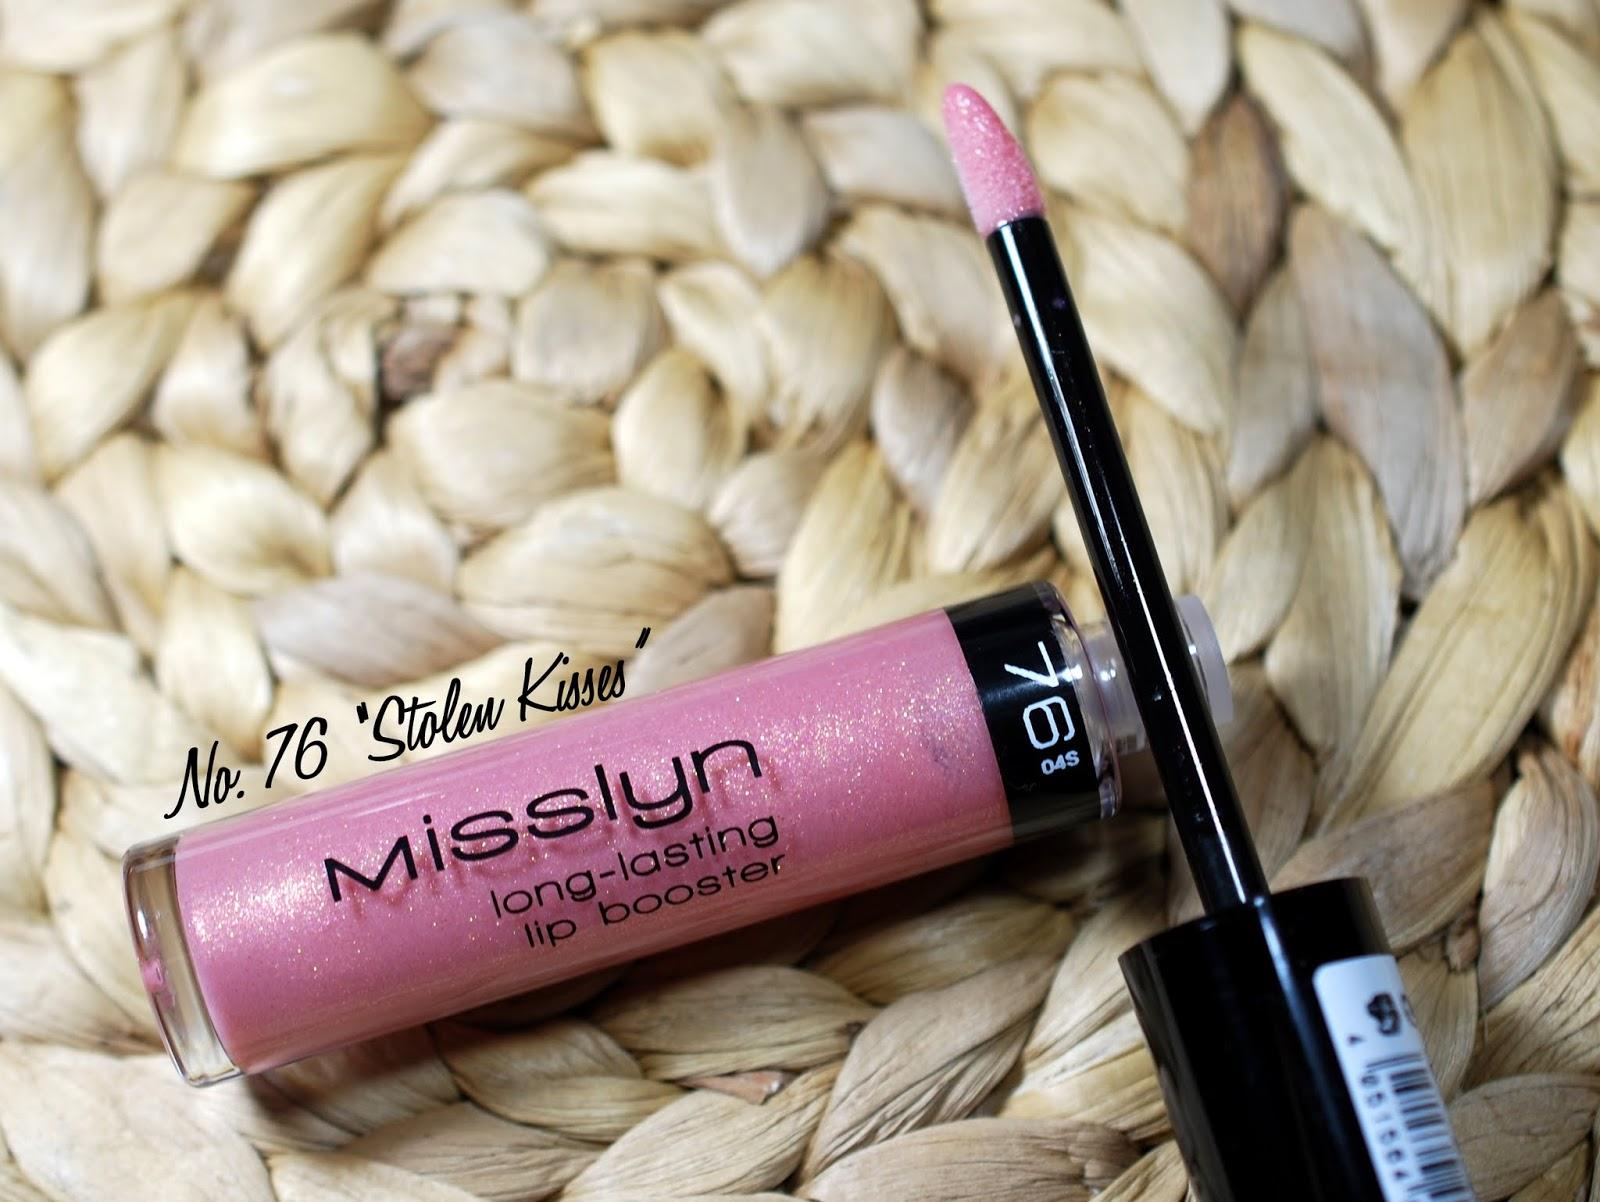 Misslyn Long-Lasting Lip Booster Nr. 76 Stolen Kisses